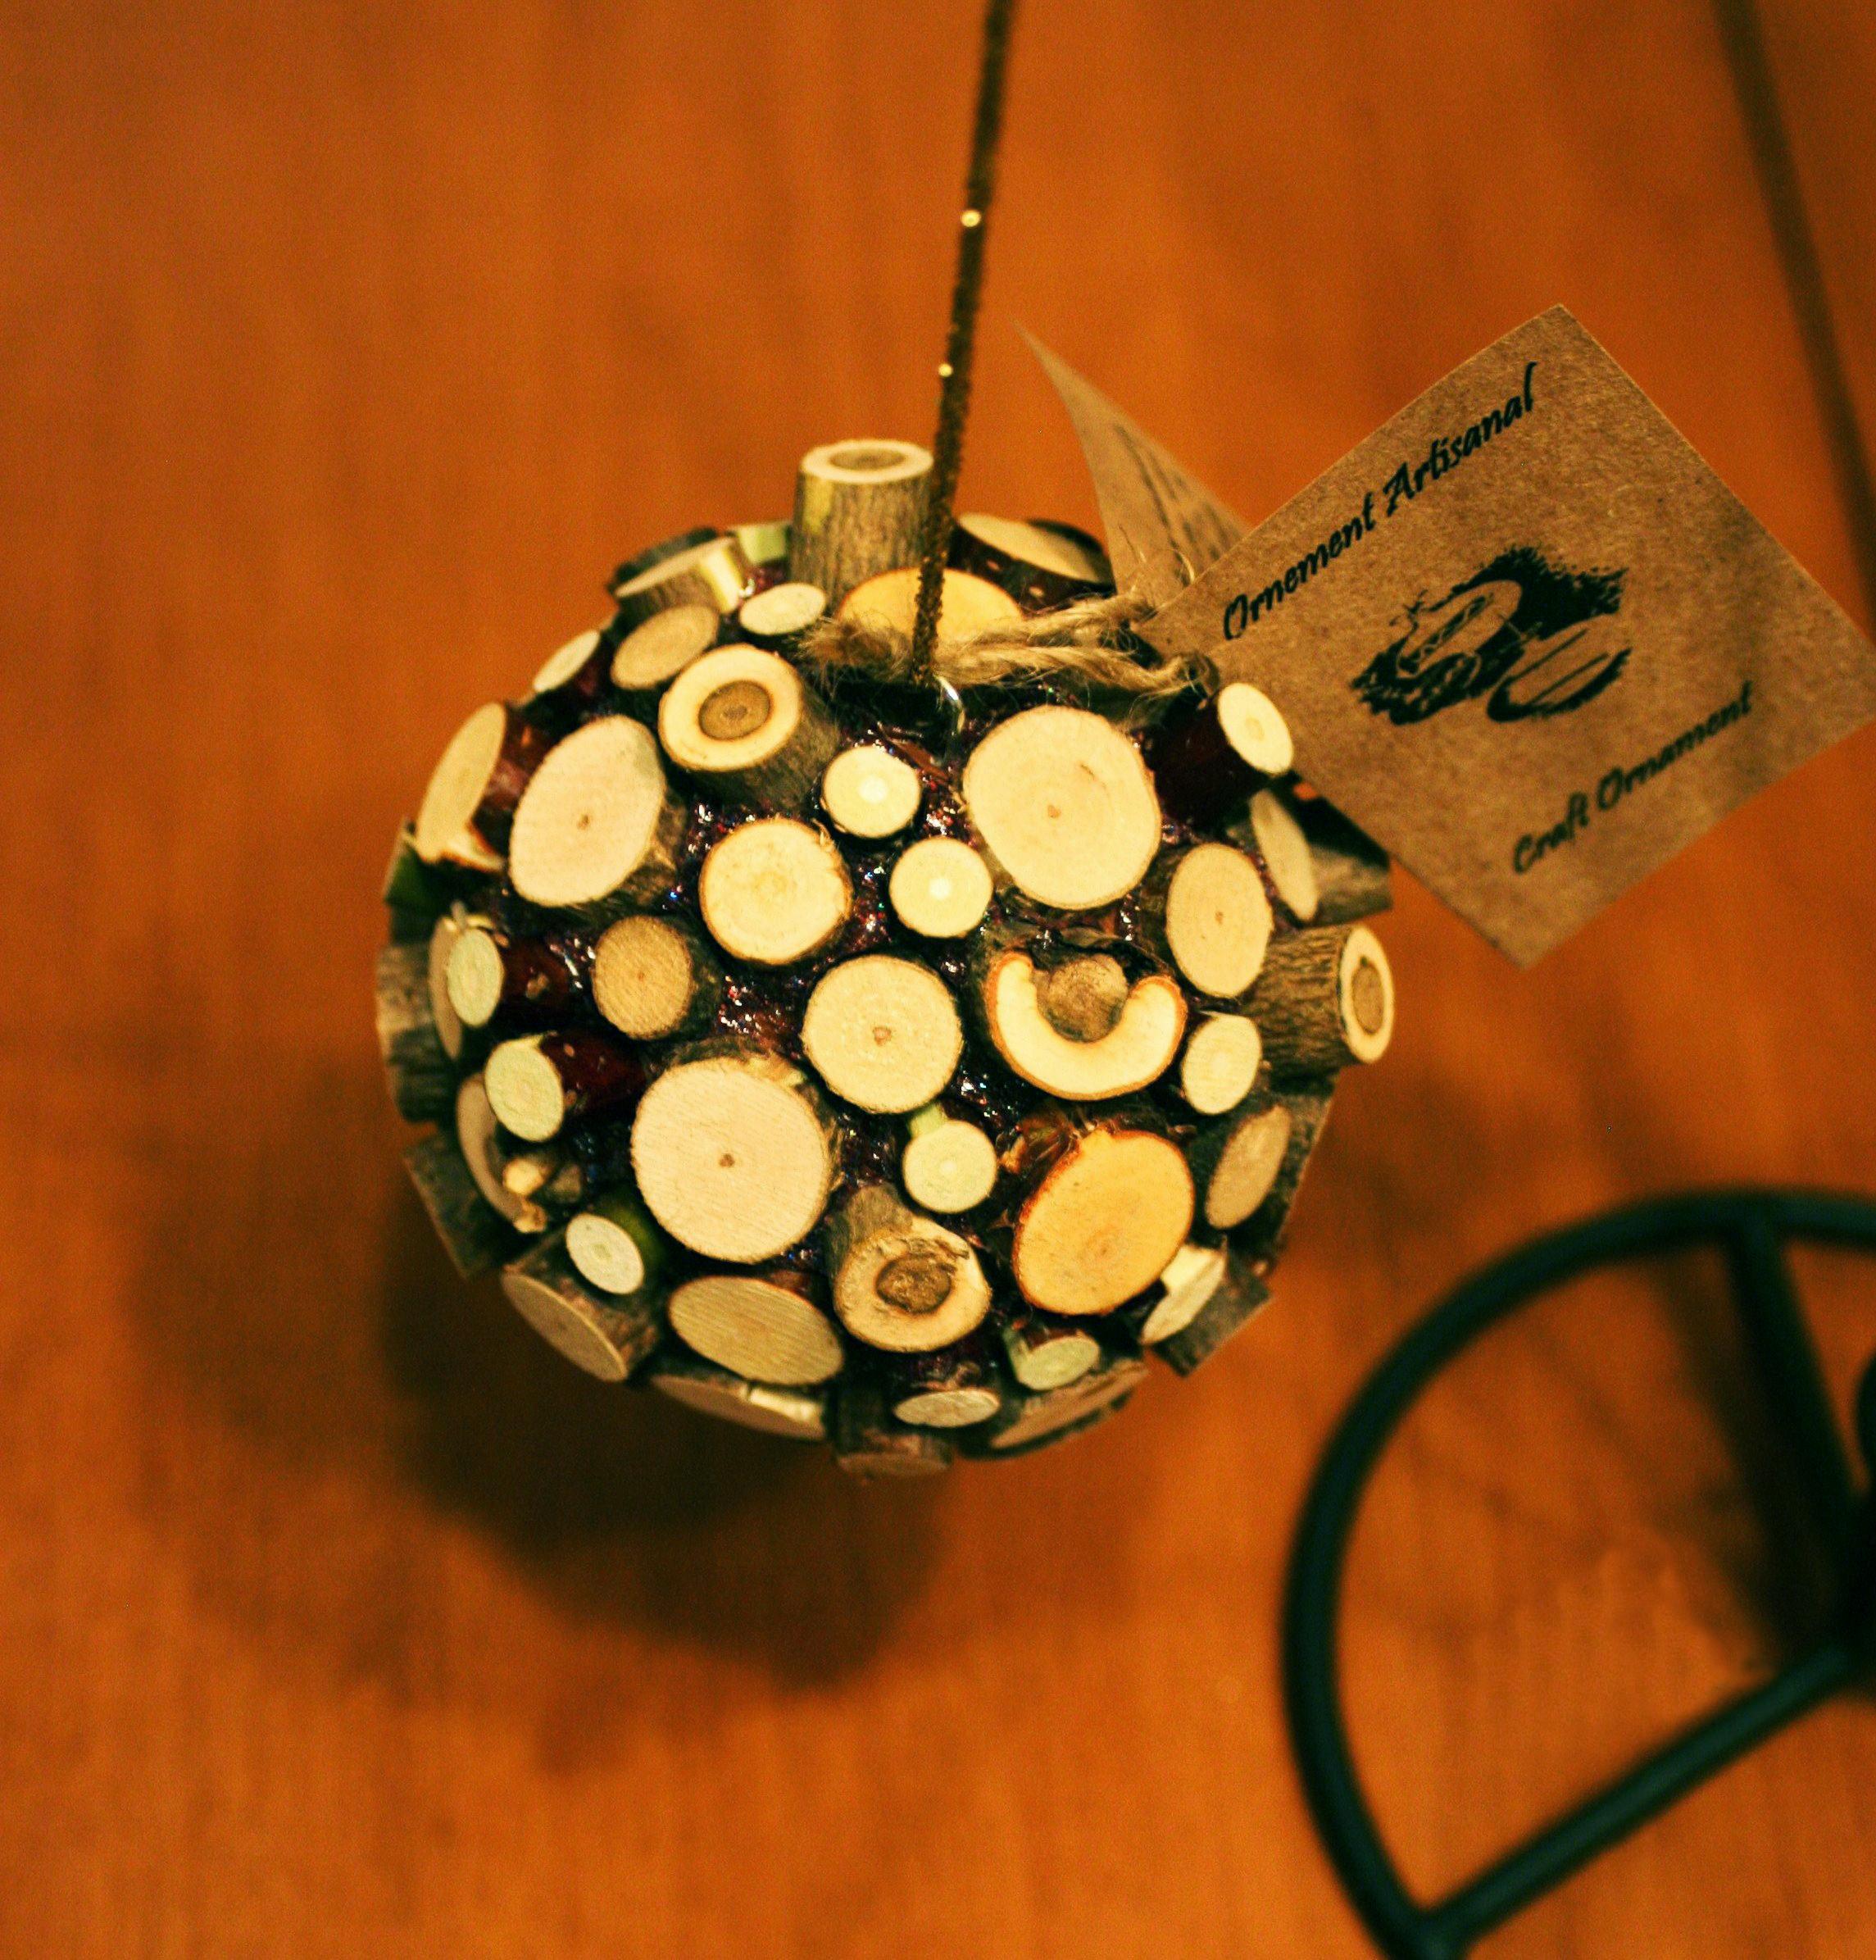 File:Agrosylva Forest Craft Ornament.jpg - Wikimedia Commons